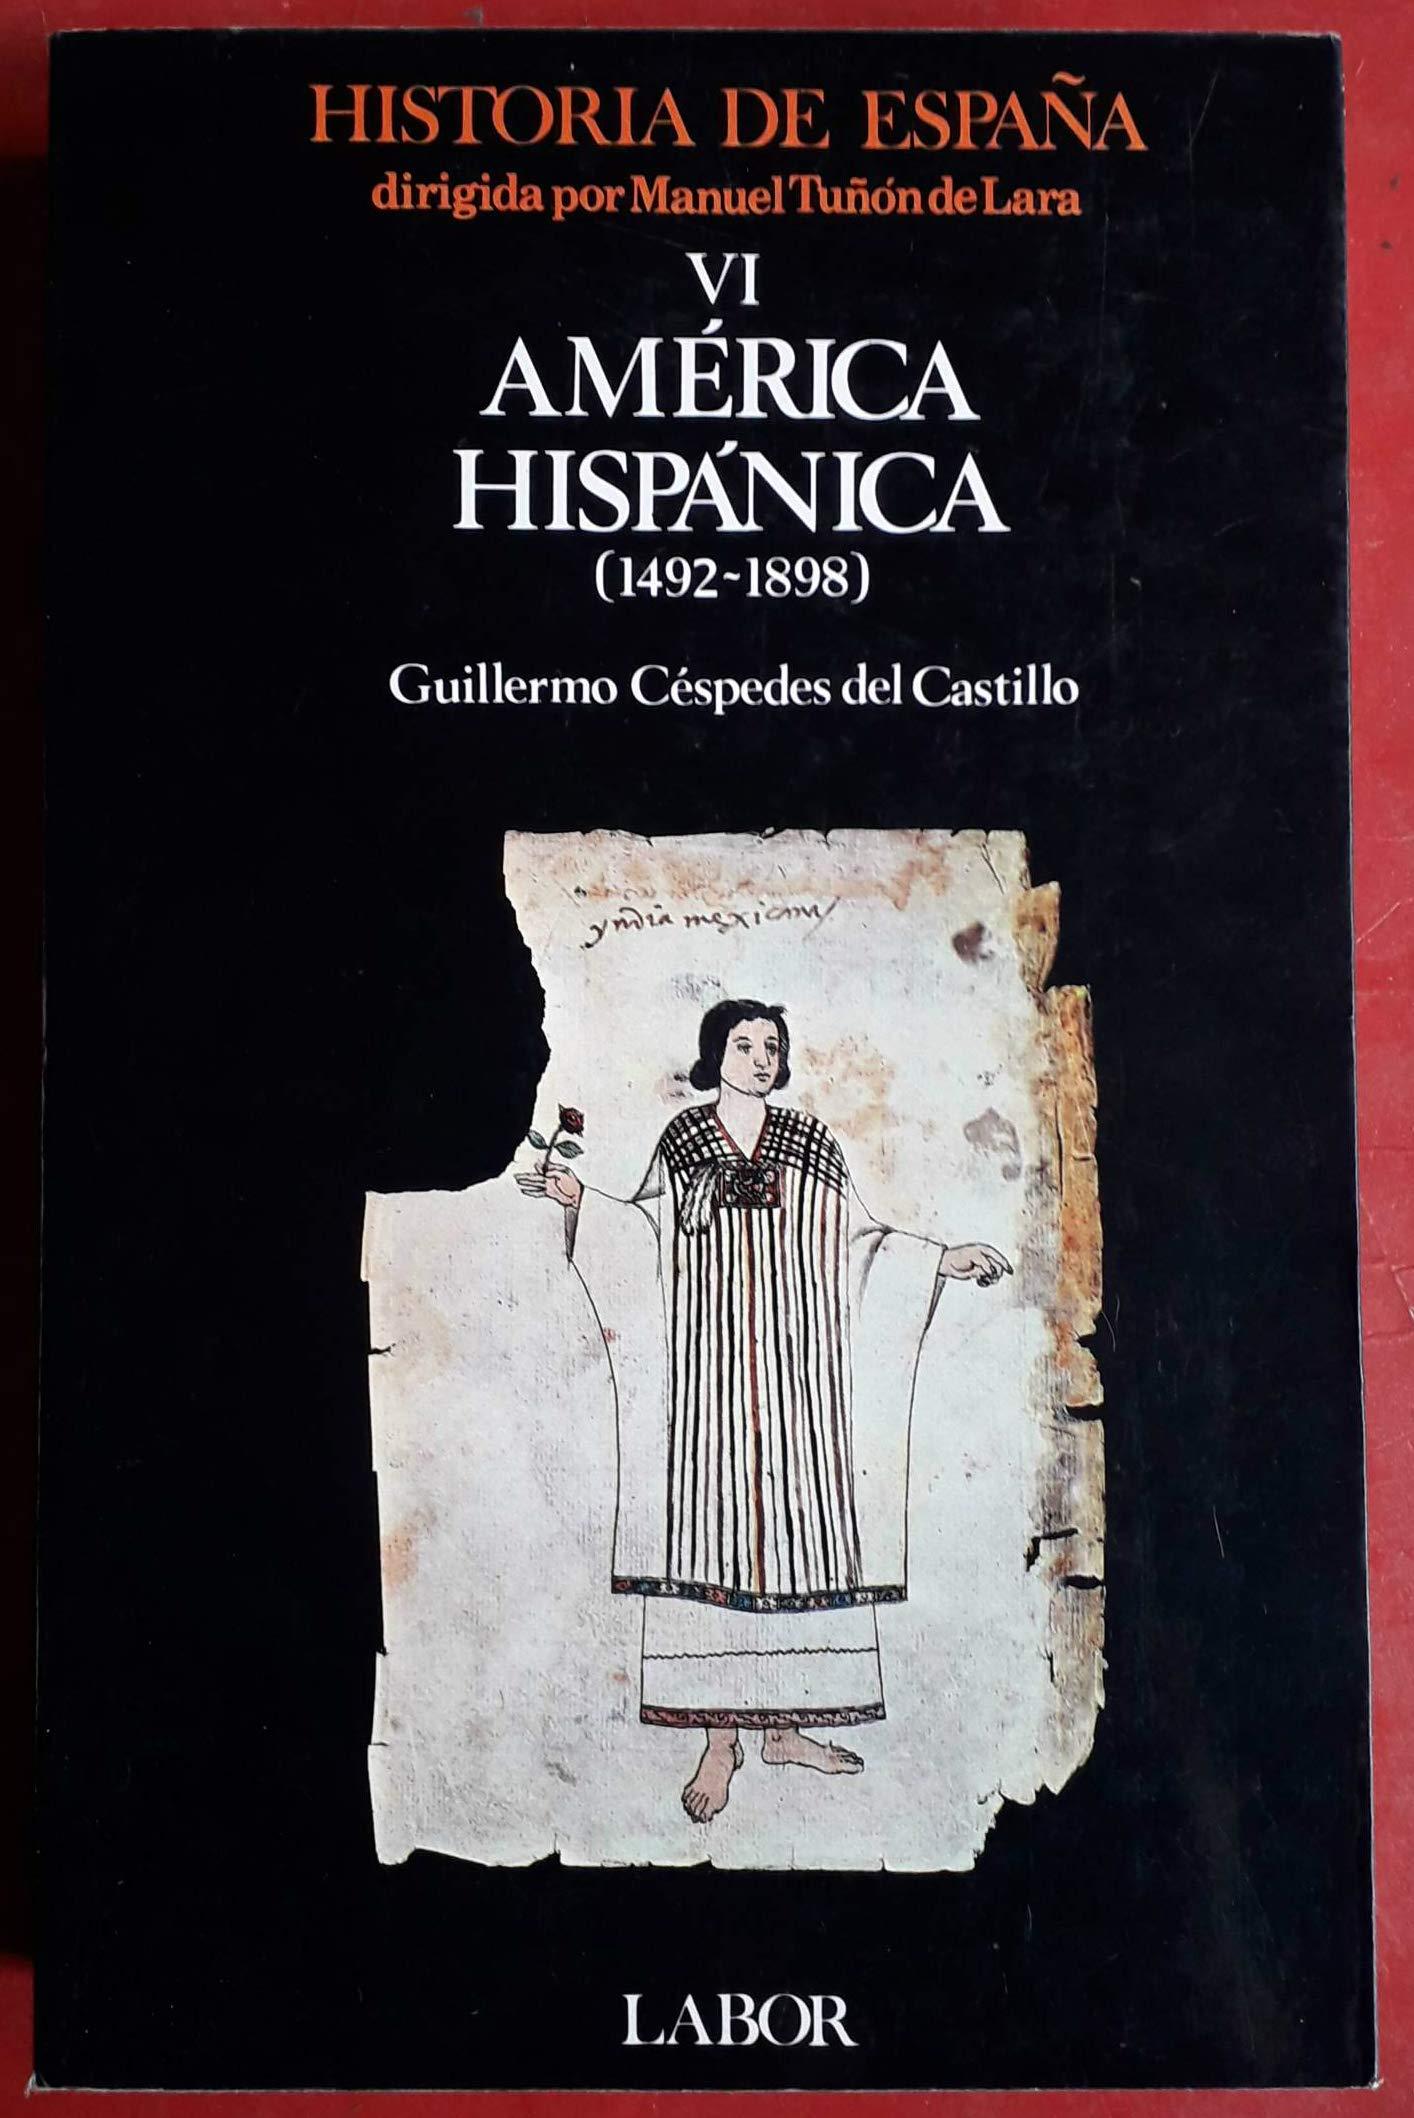 Historia de España viamerica hispanica: Amazon.es: Tuñon De Lara. Cespedes Castillo: Libros